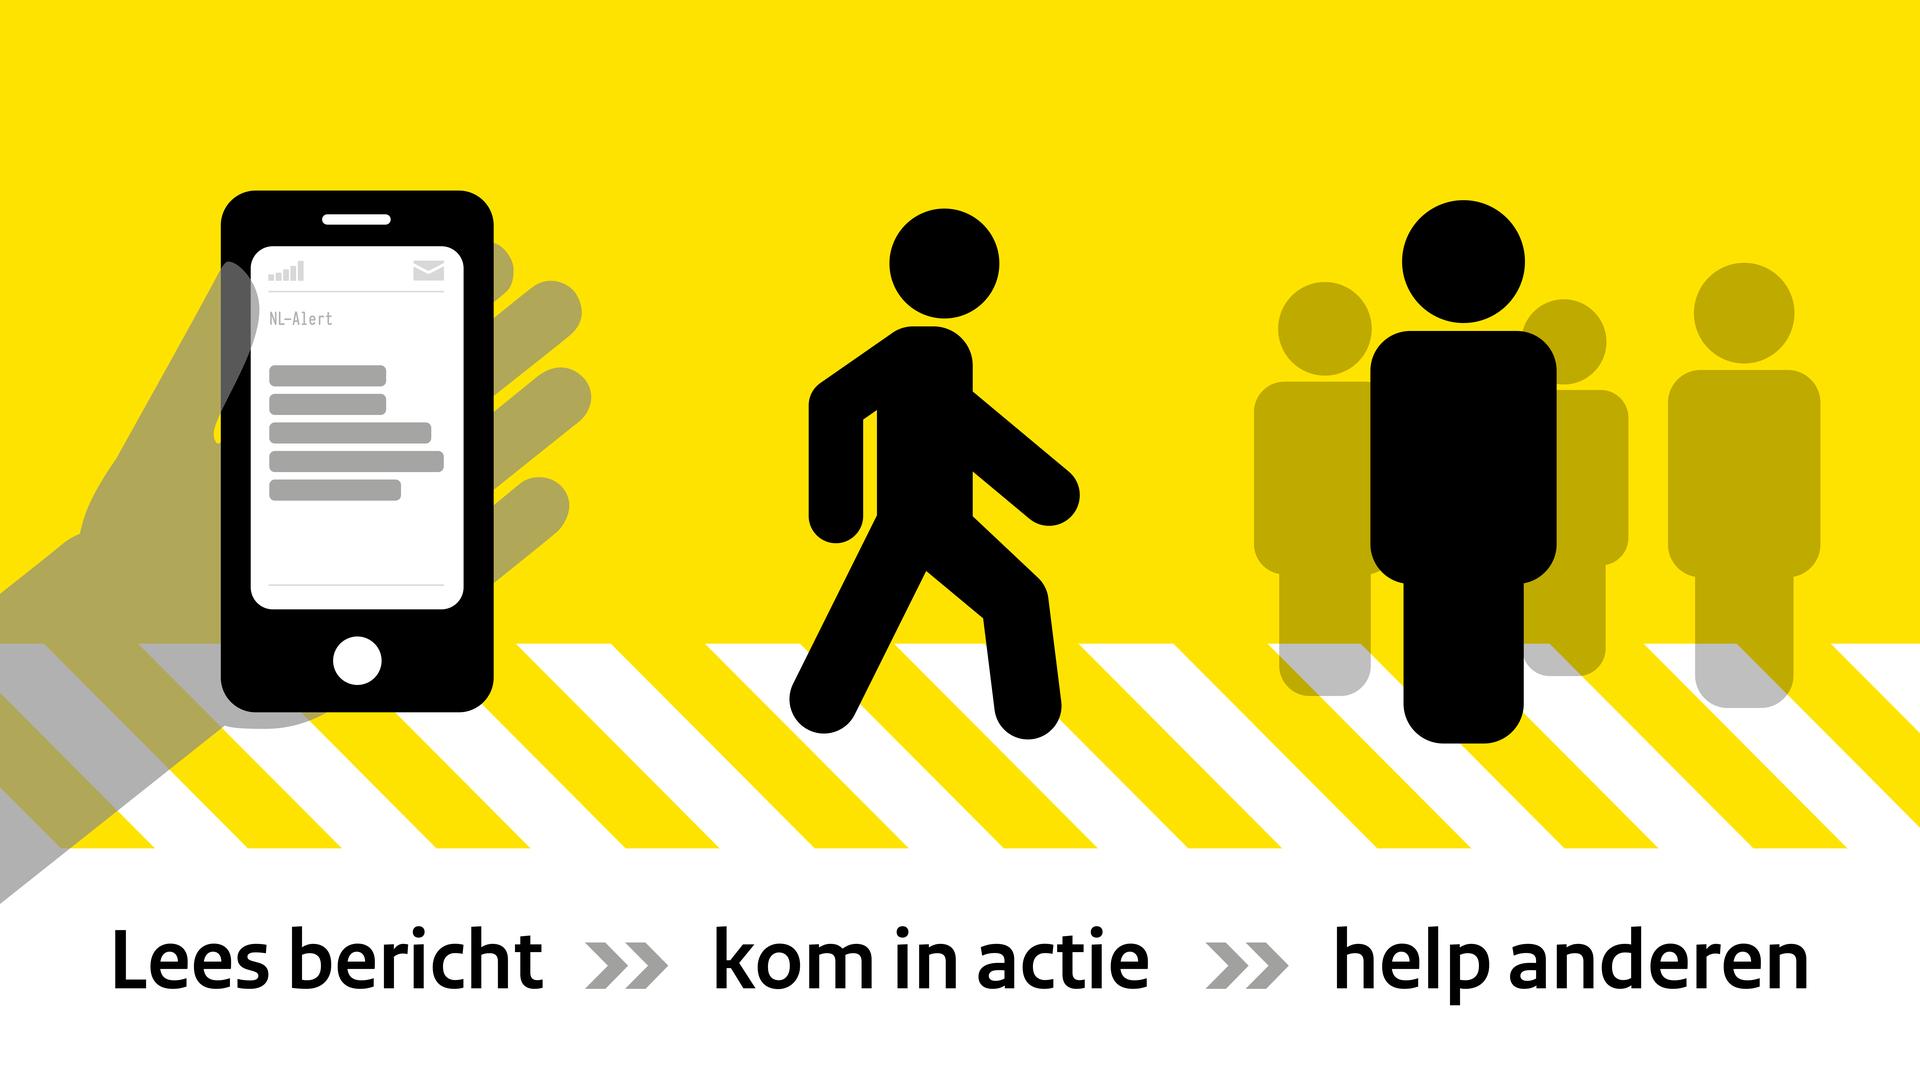 NL-Alert campagne van start